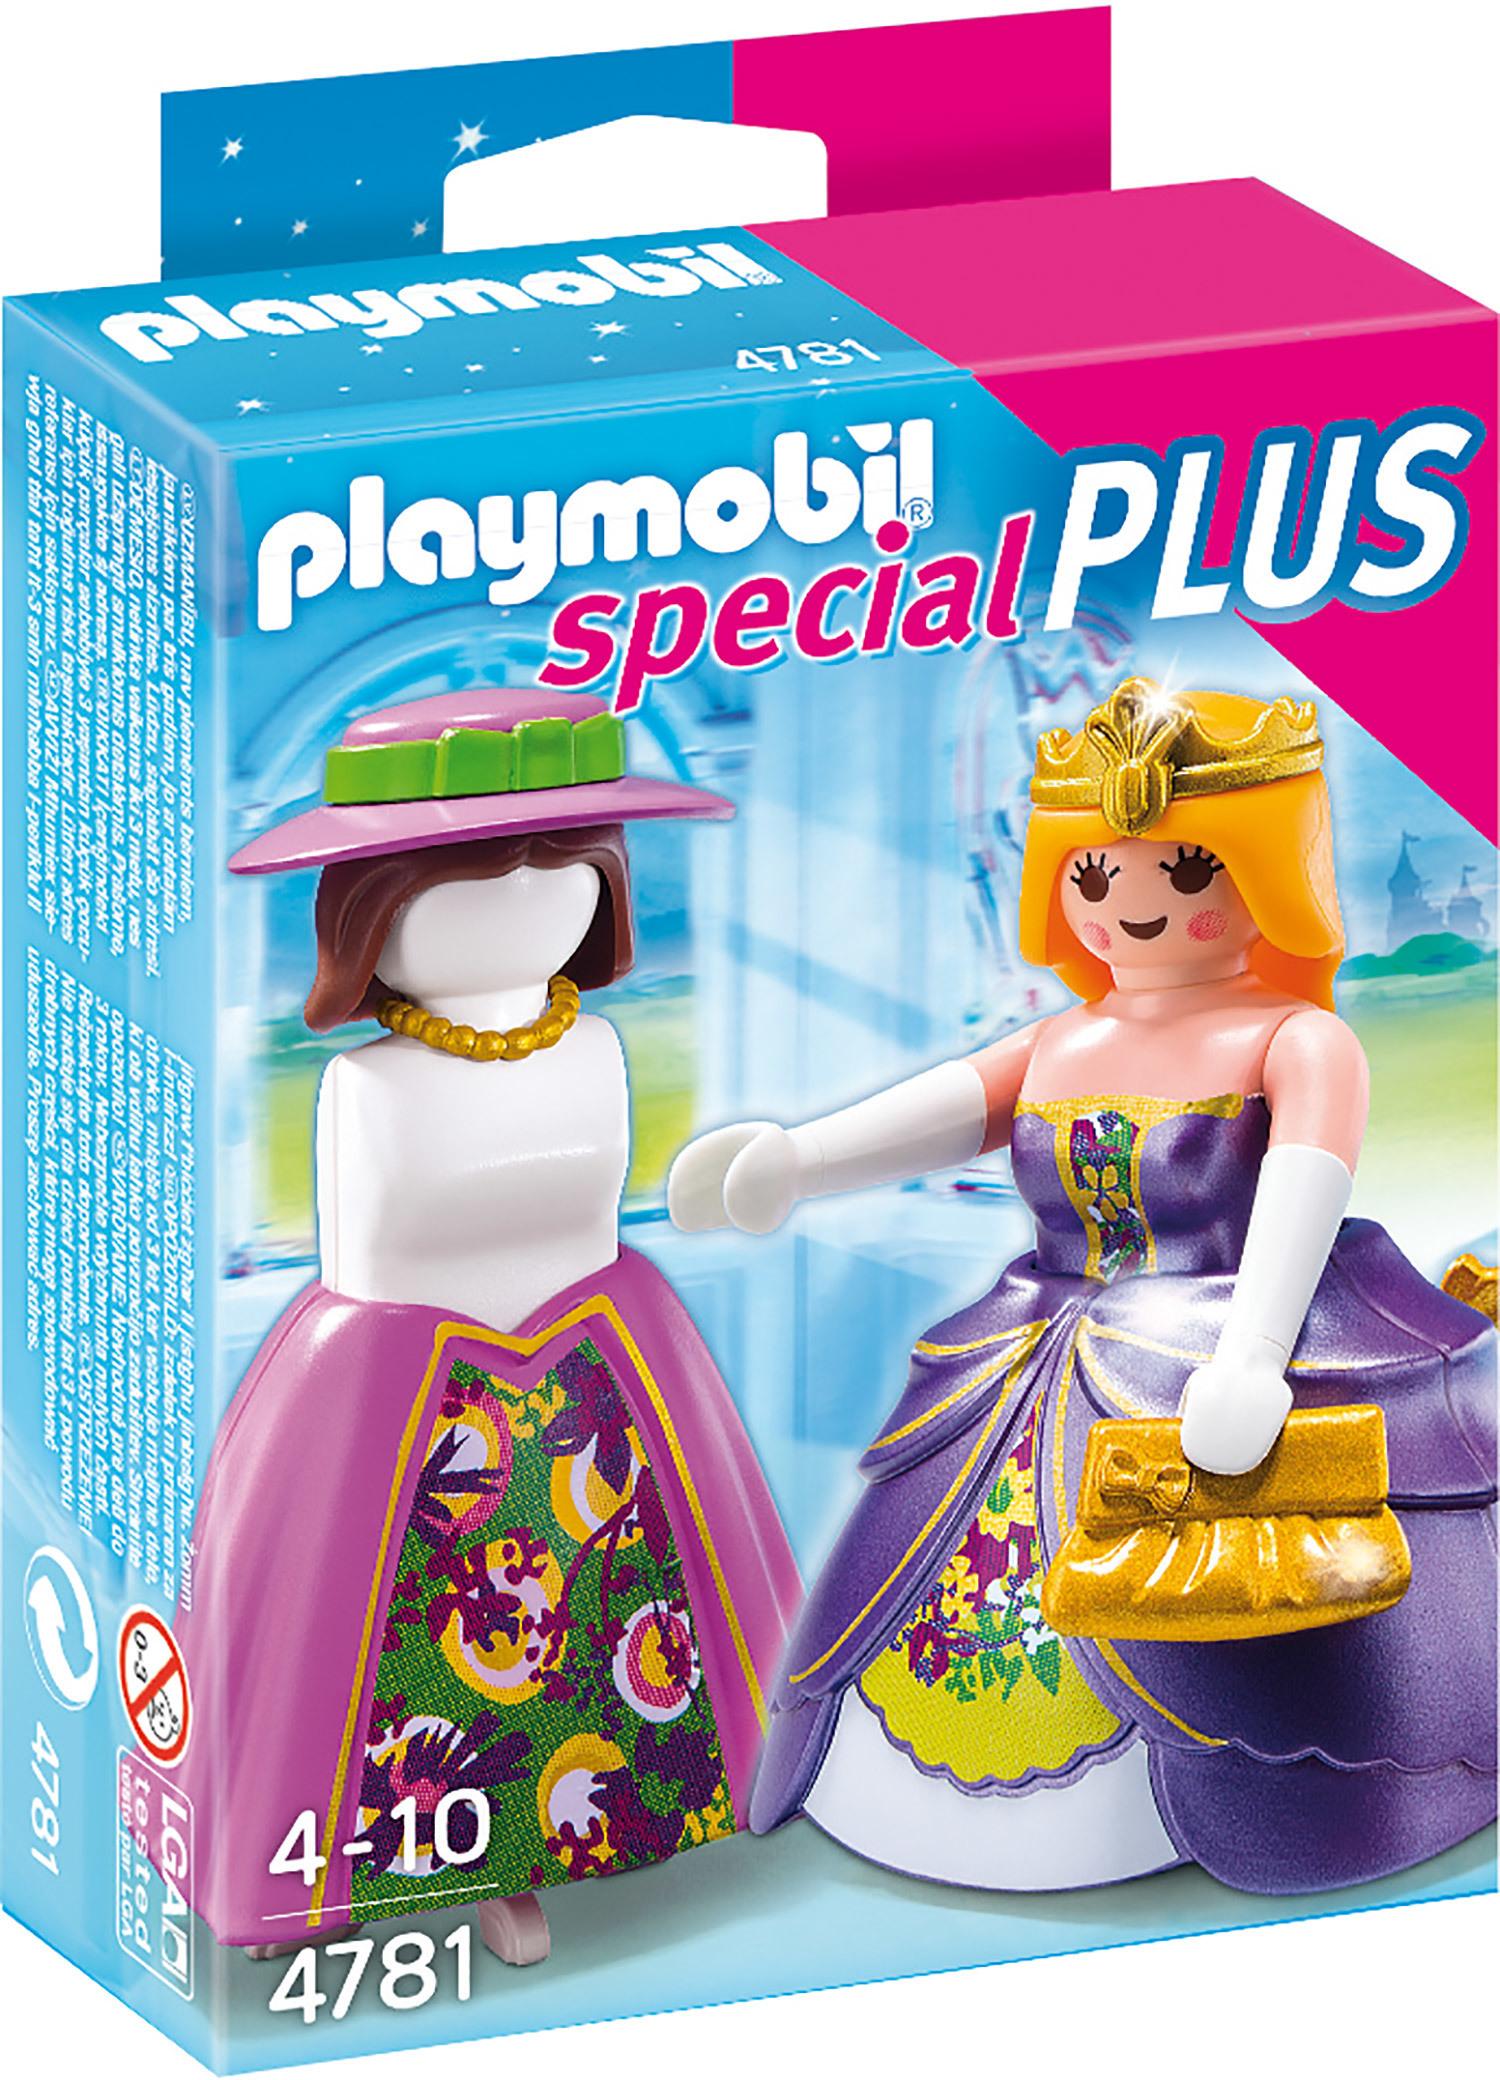 Princesse avec mannequin - Playmobil Special Plus - 4781